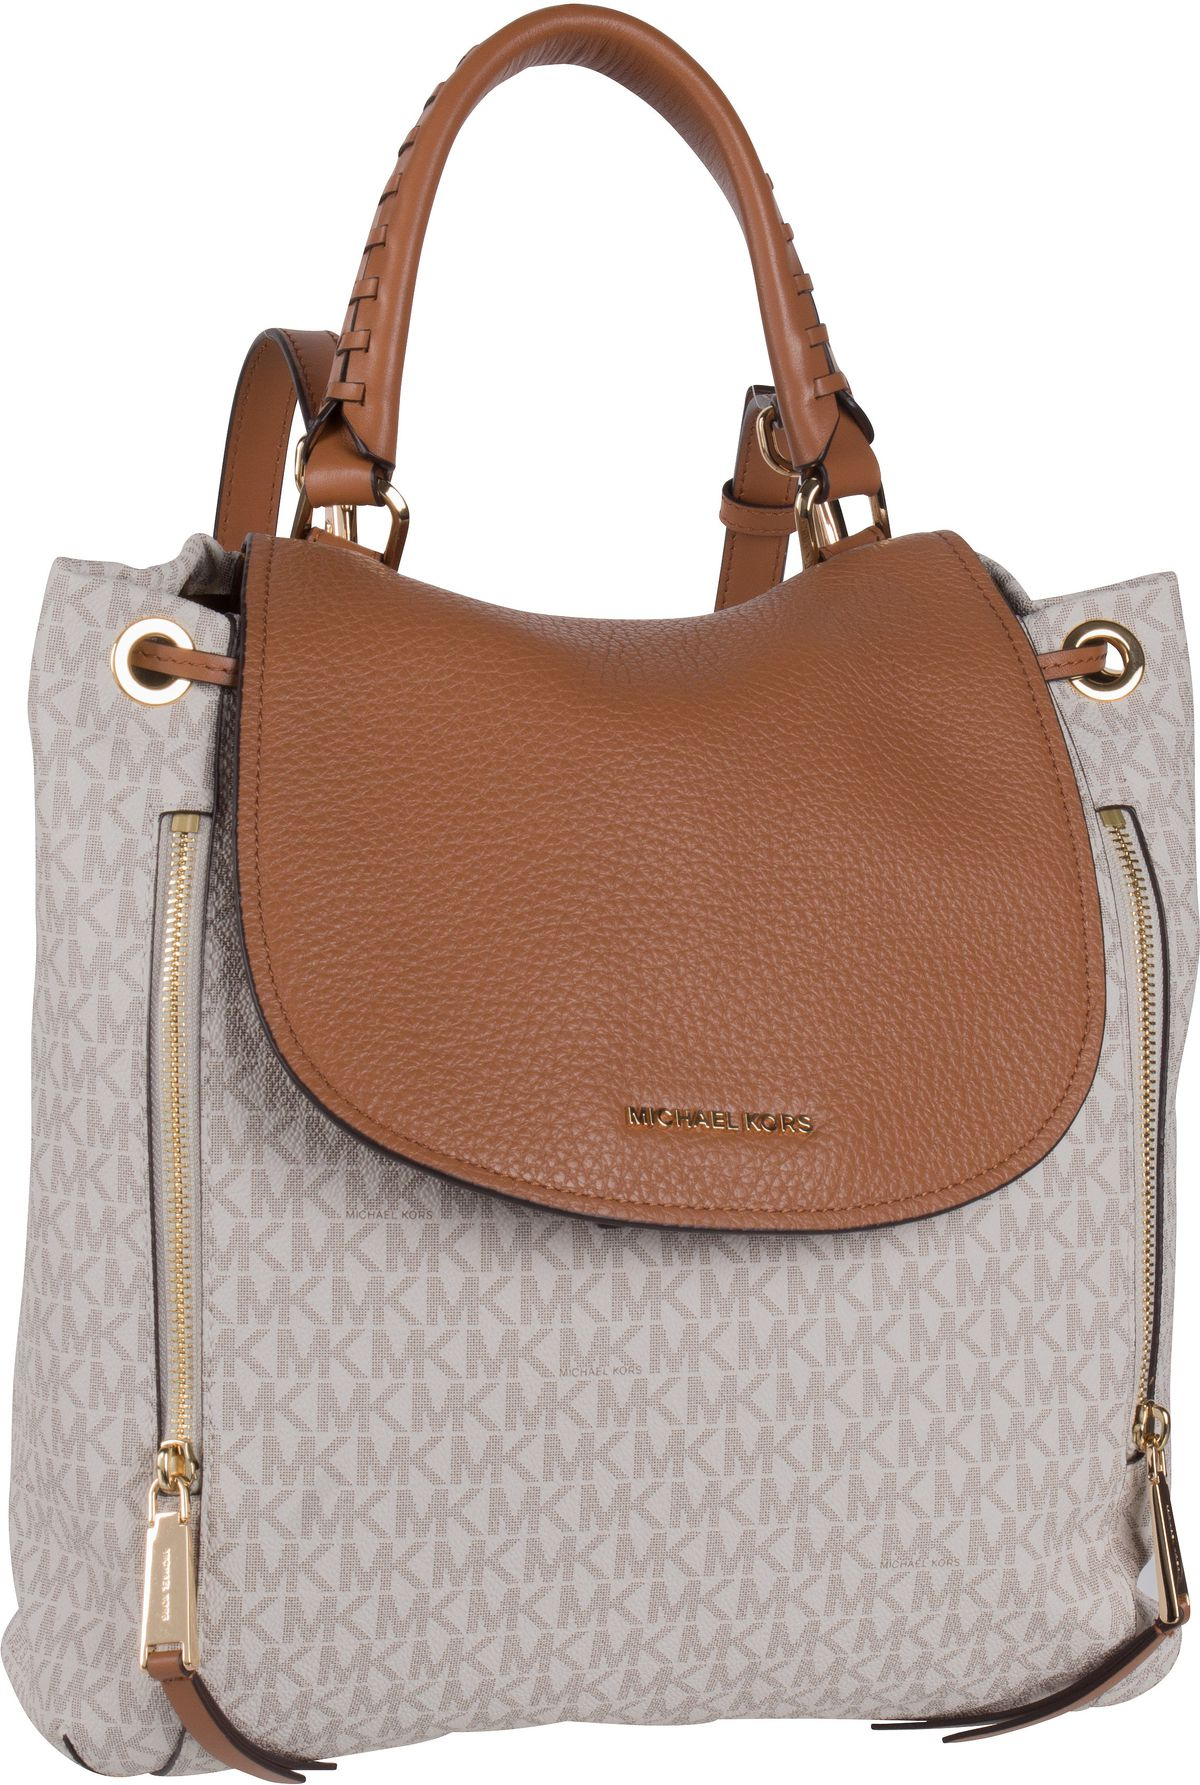 Rucksack / Daypack Viv Large Backpack MK Signature Vanilla/Acorn